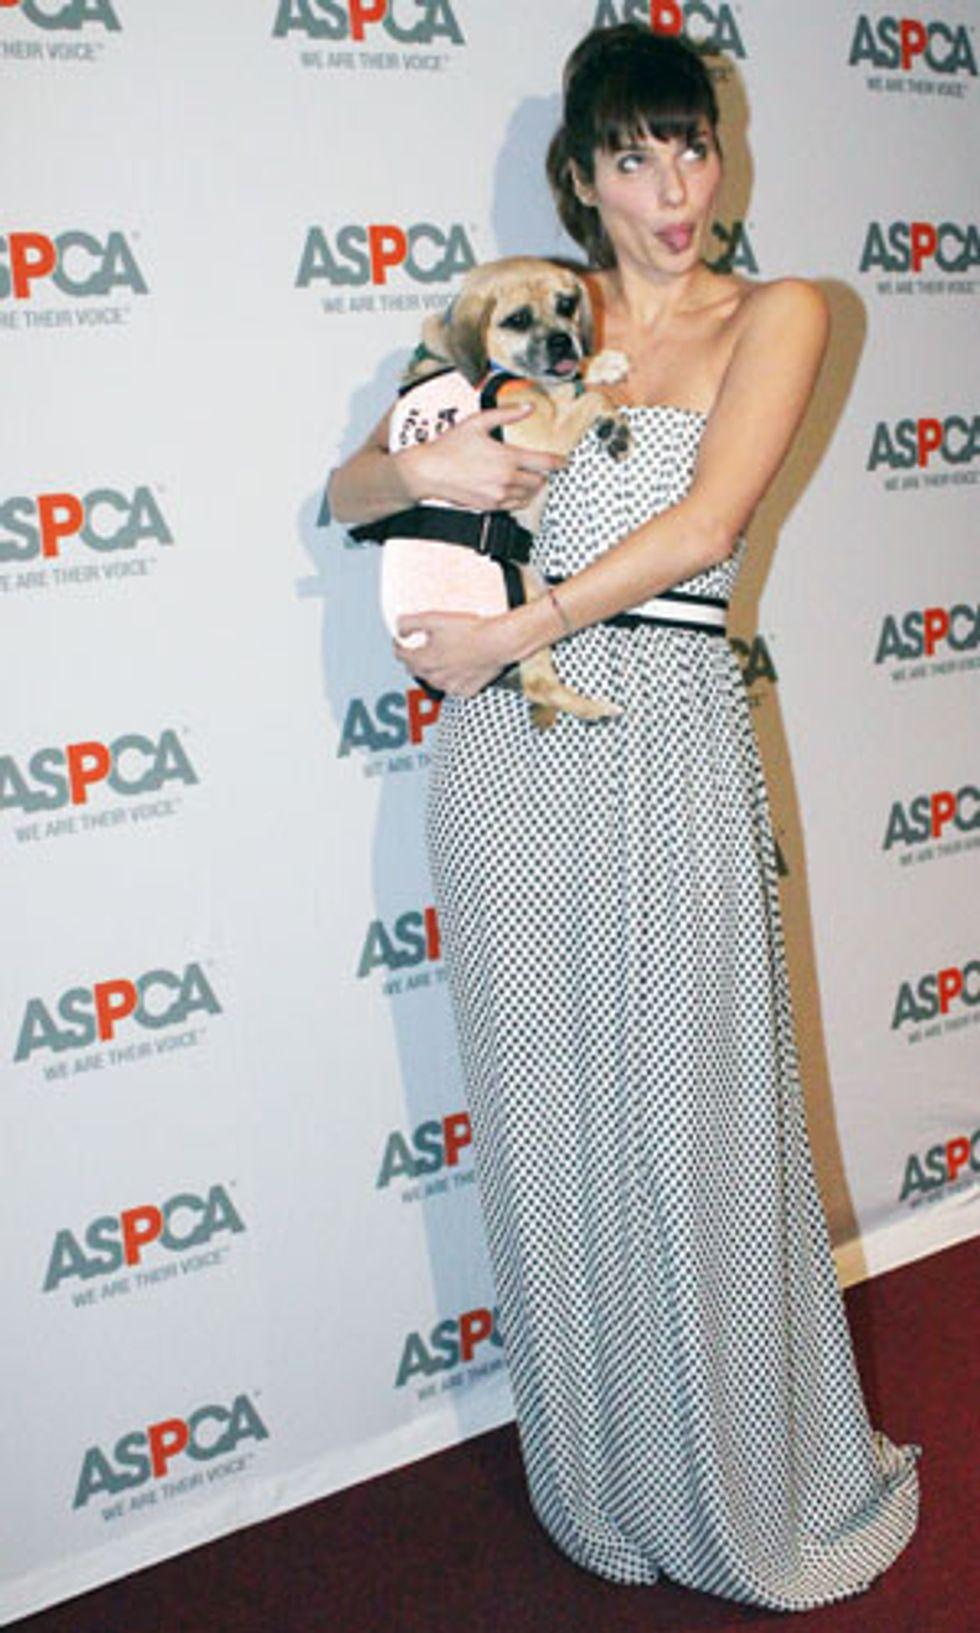 ASPCA Hosts the 14th Annual ASPCA Bergh Ball at the Plaza